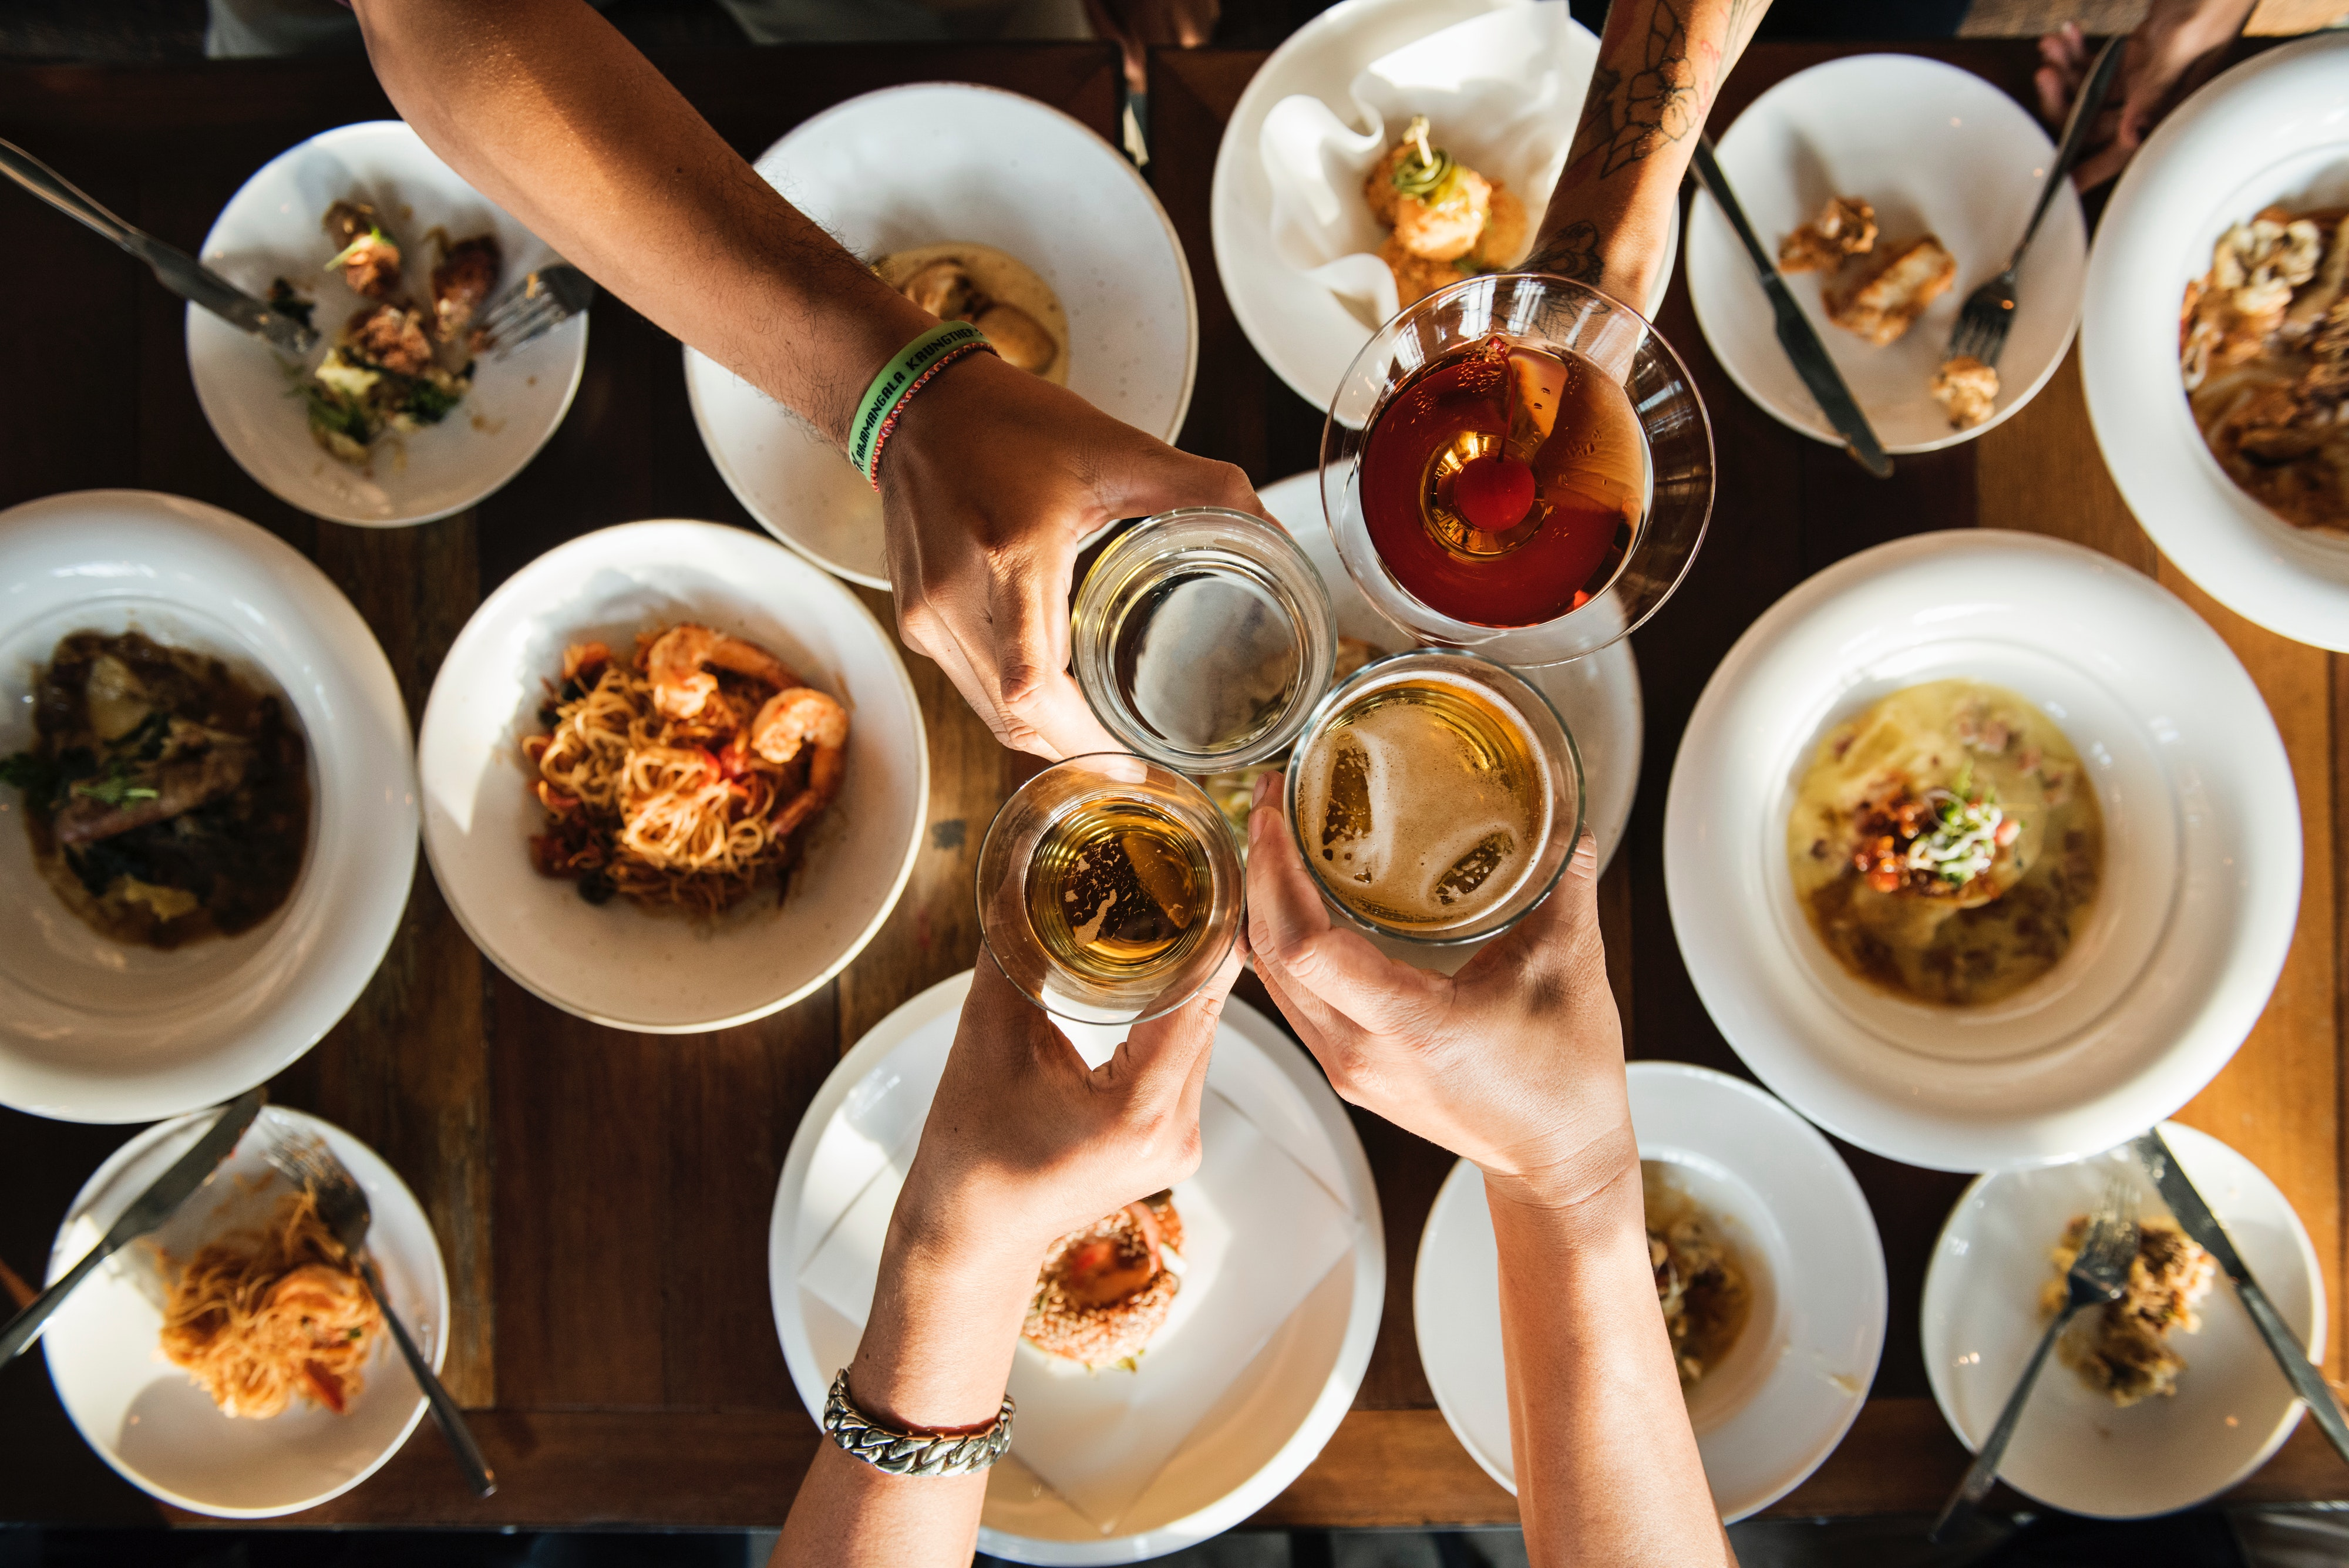 Dinner Food And Beverage